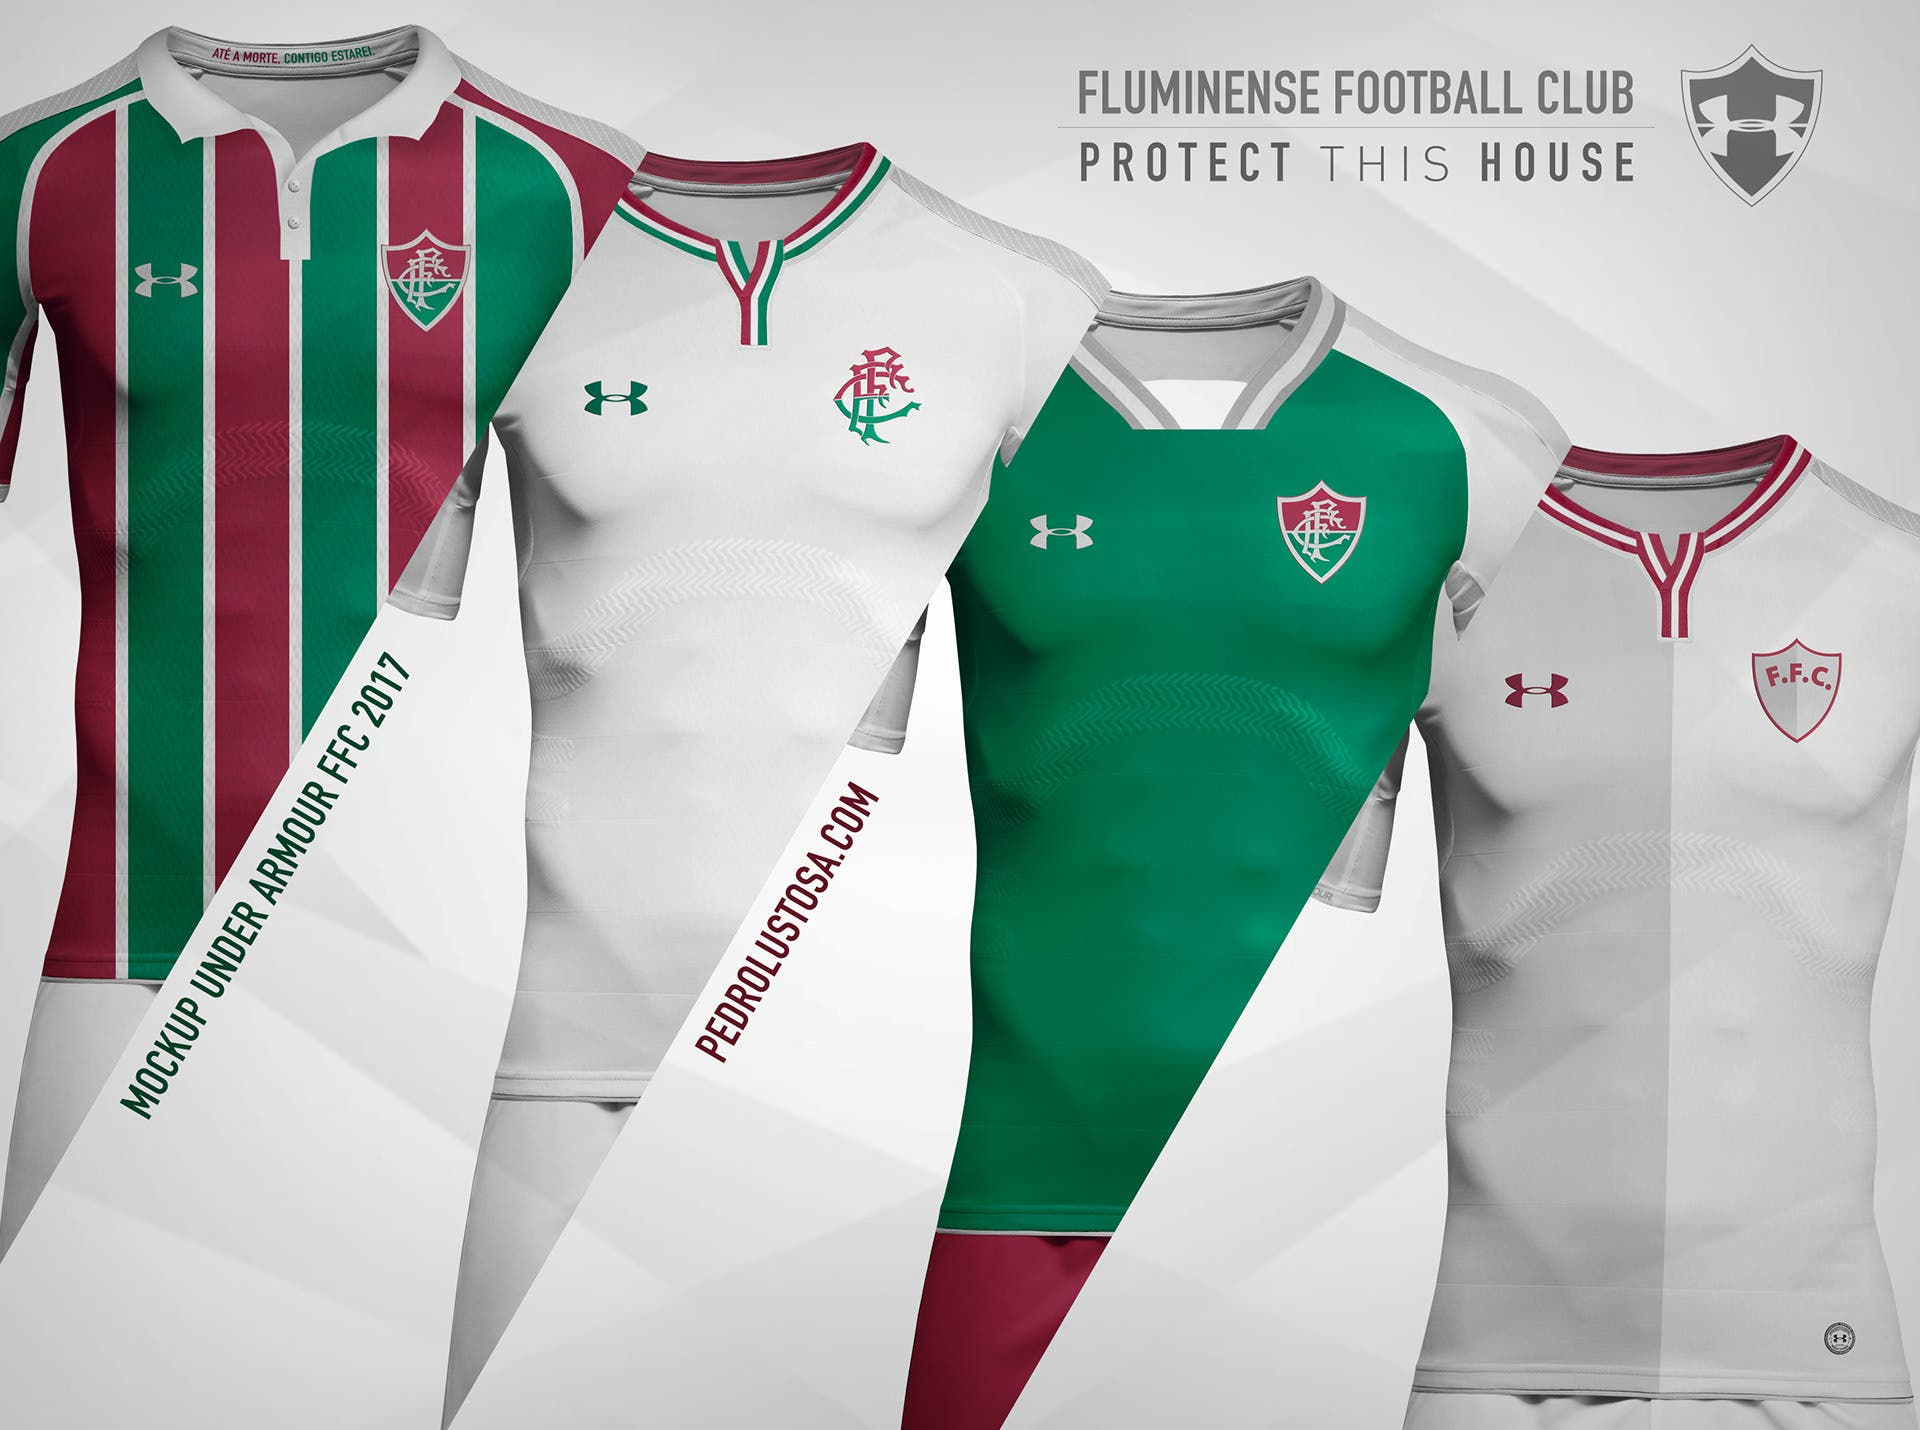 55ebee9cfce46 Designer tricolor faz mockups de uniformes do Fluminense para a ...